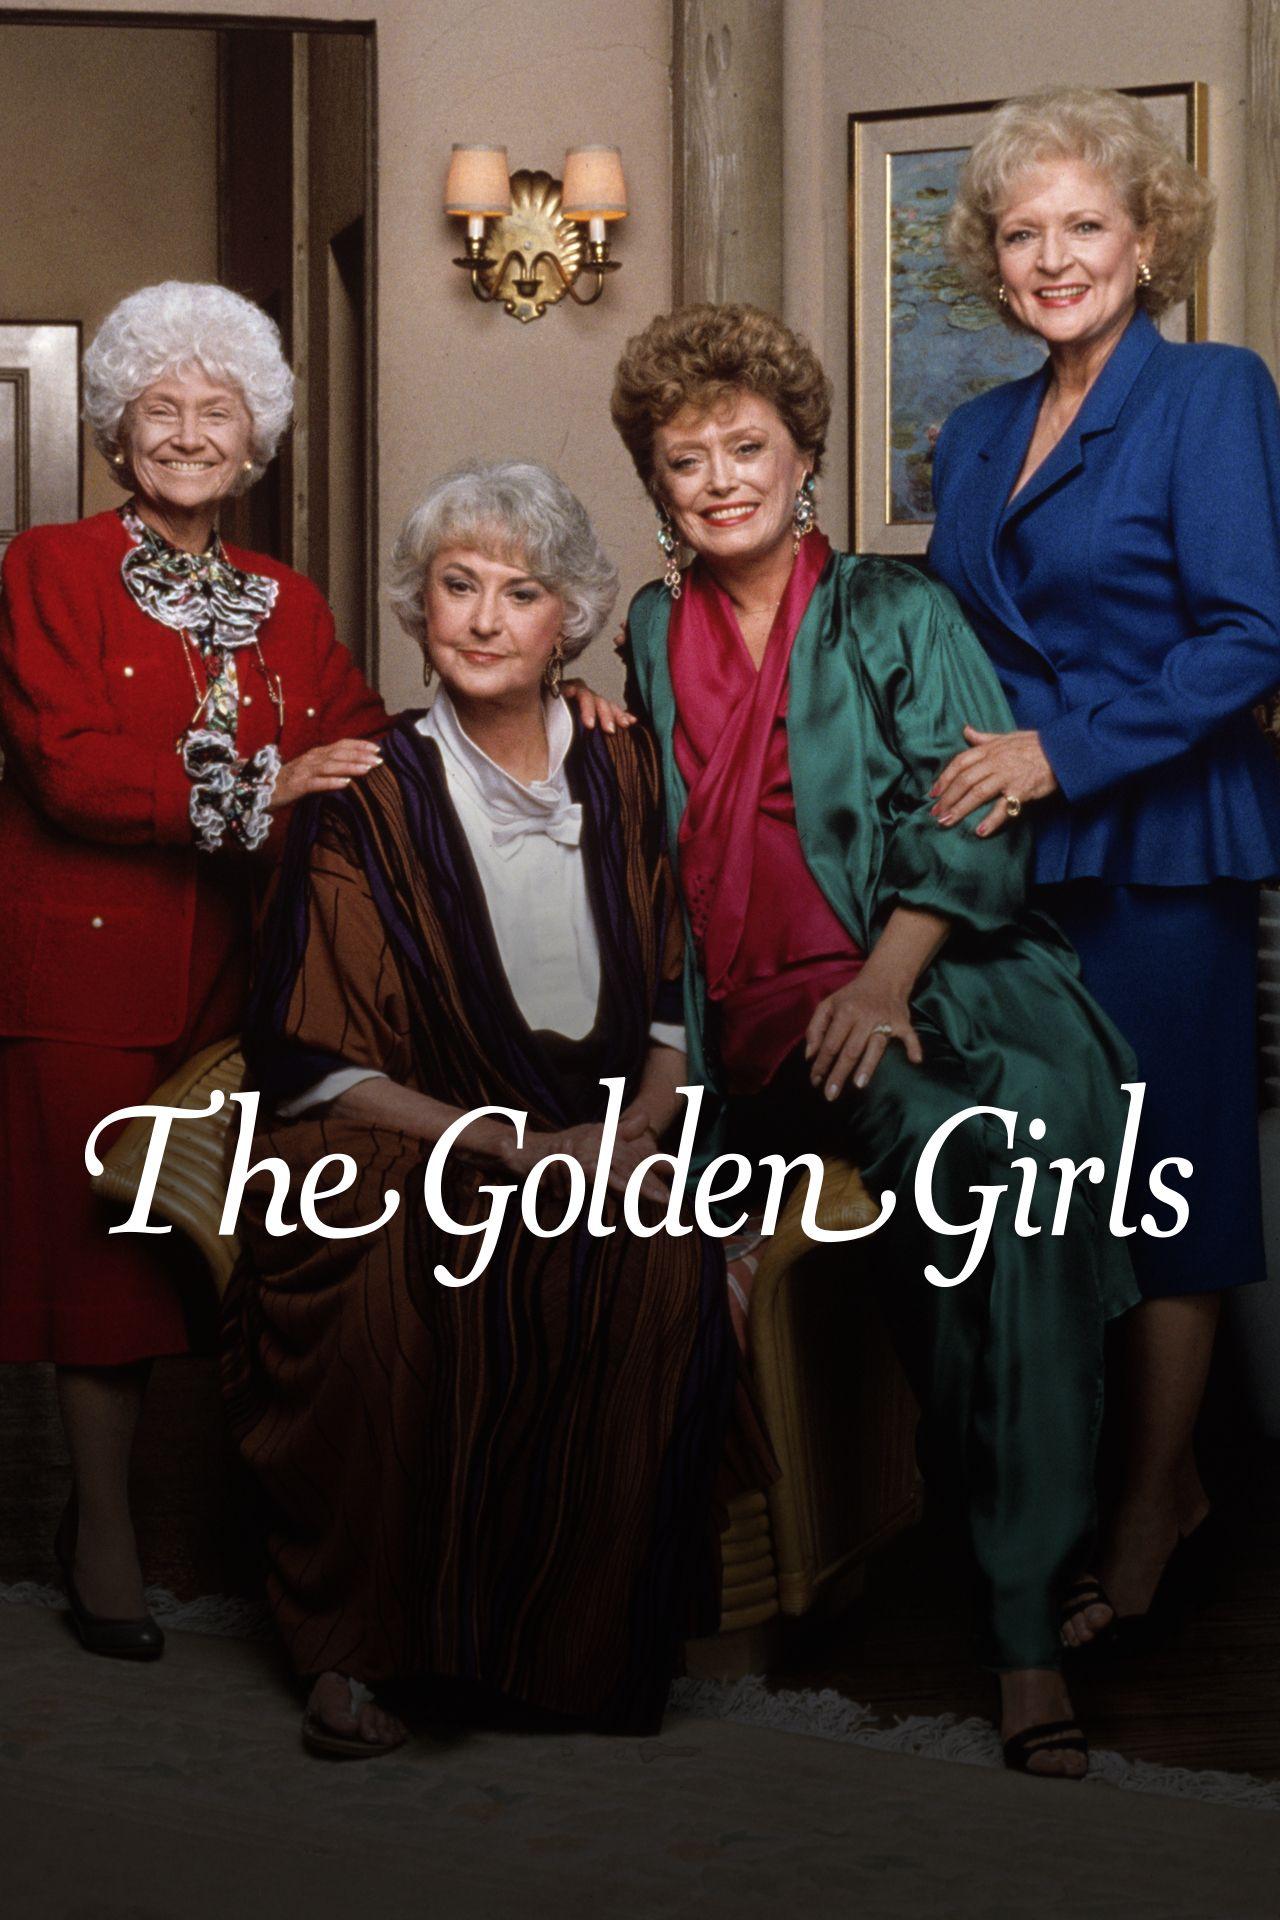 The golden girls (season 5) wikipedia.